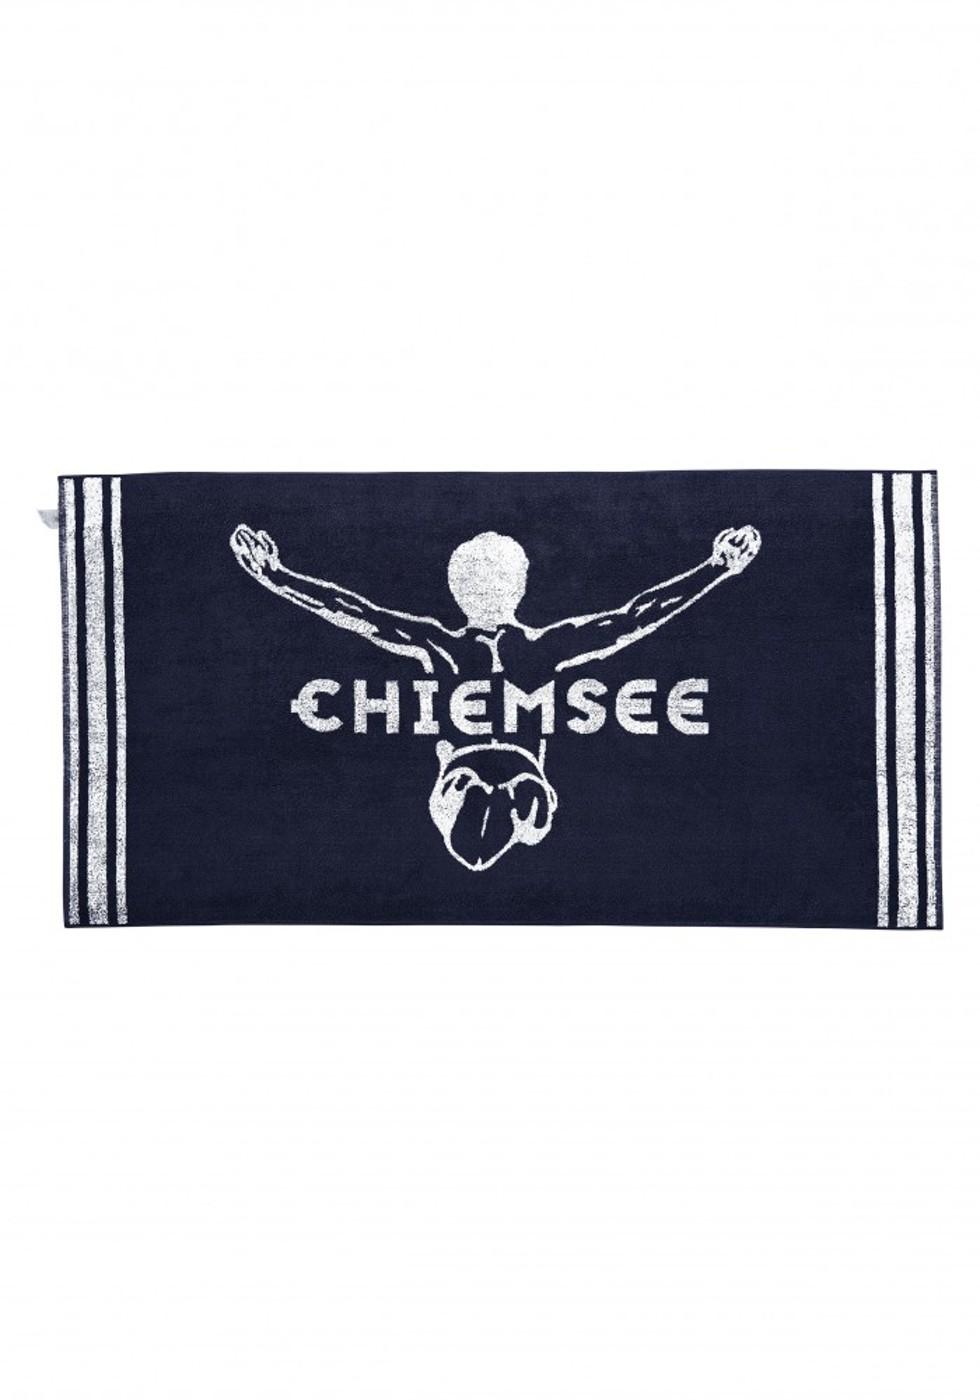 CHIEMSEE TOWEL Unisex